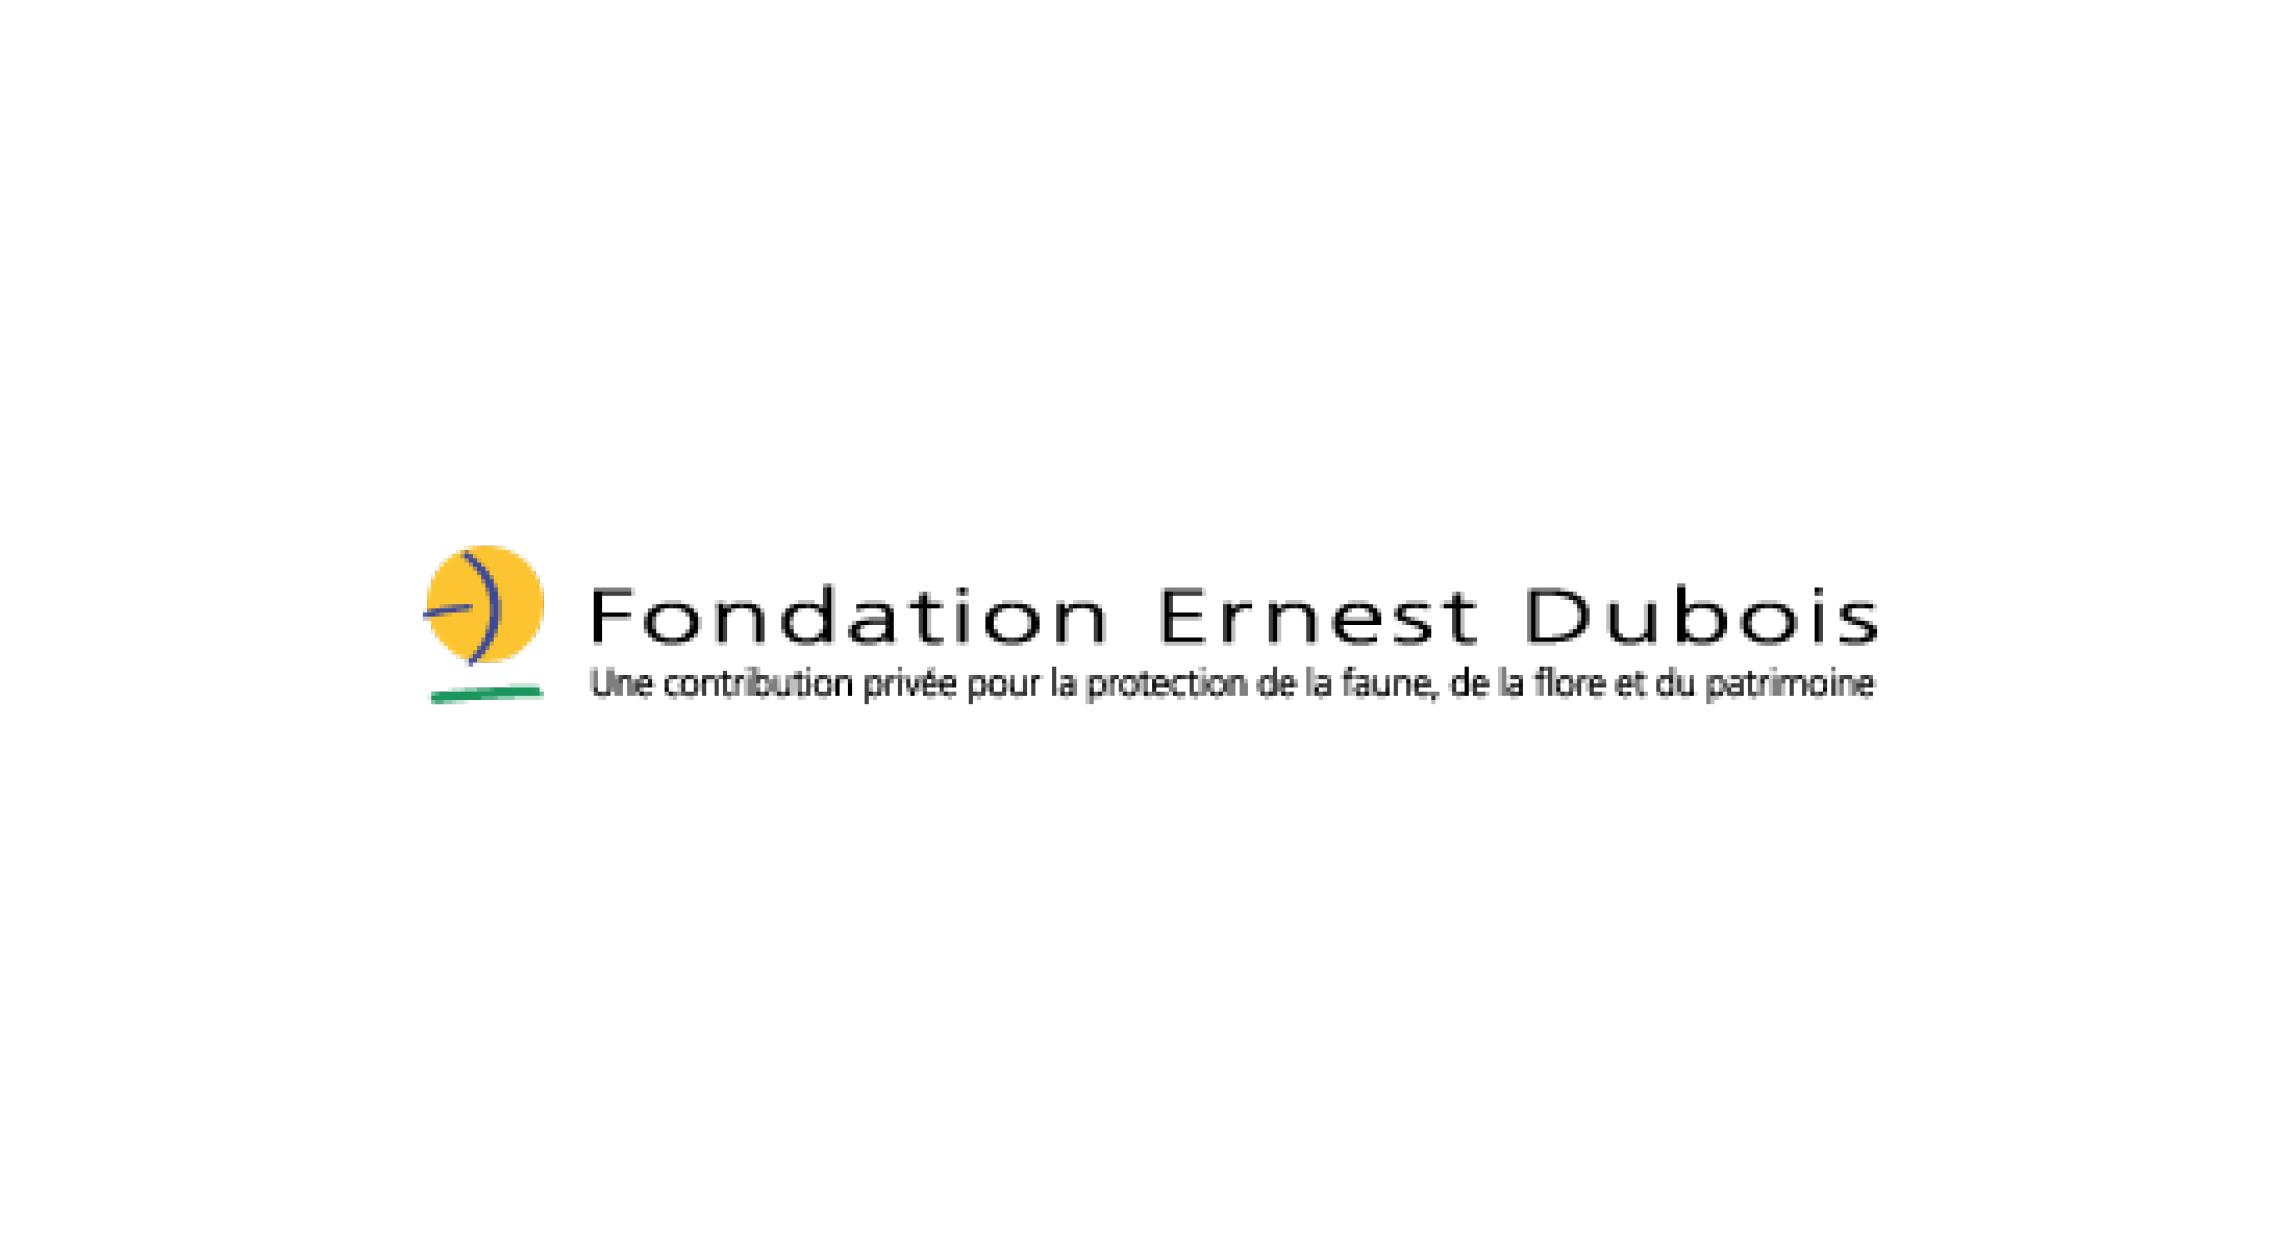 Fondation Ernest Dubois